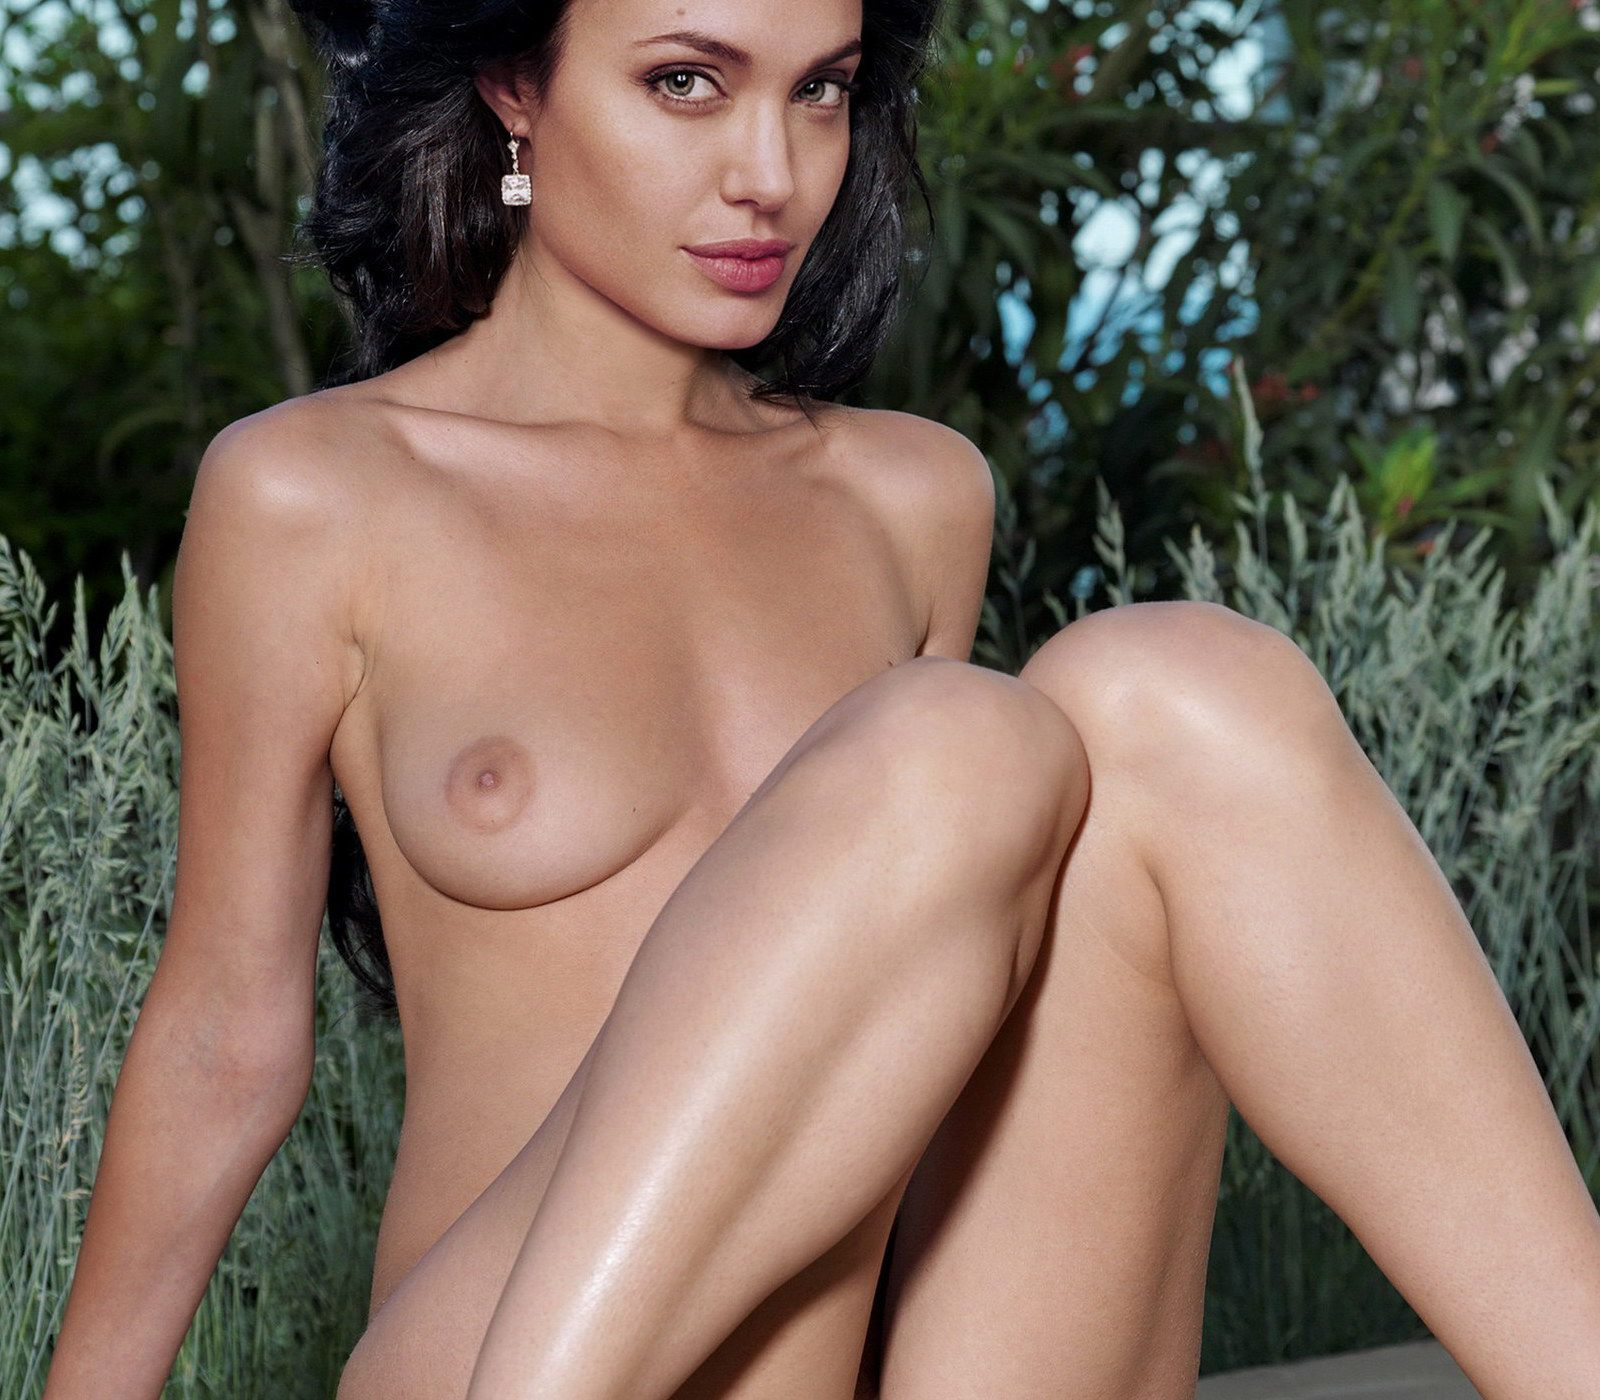 Young angela joly naked, lesbian porn orgasm